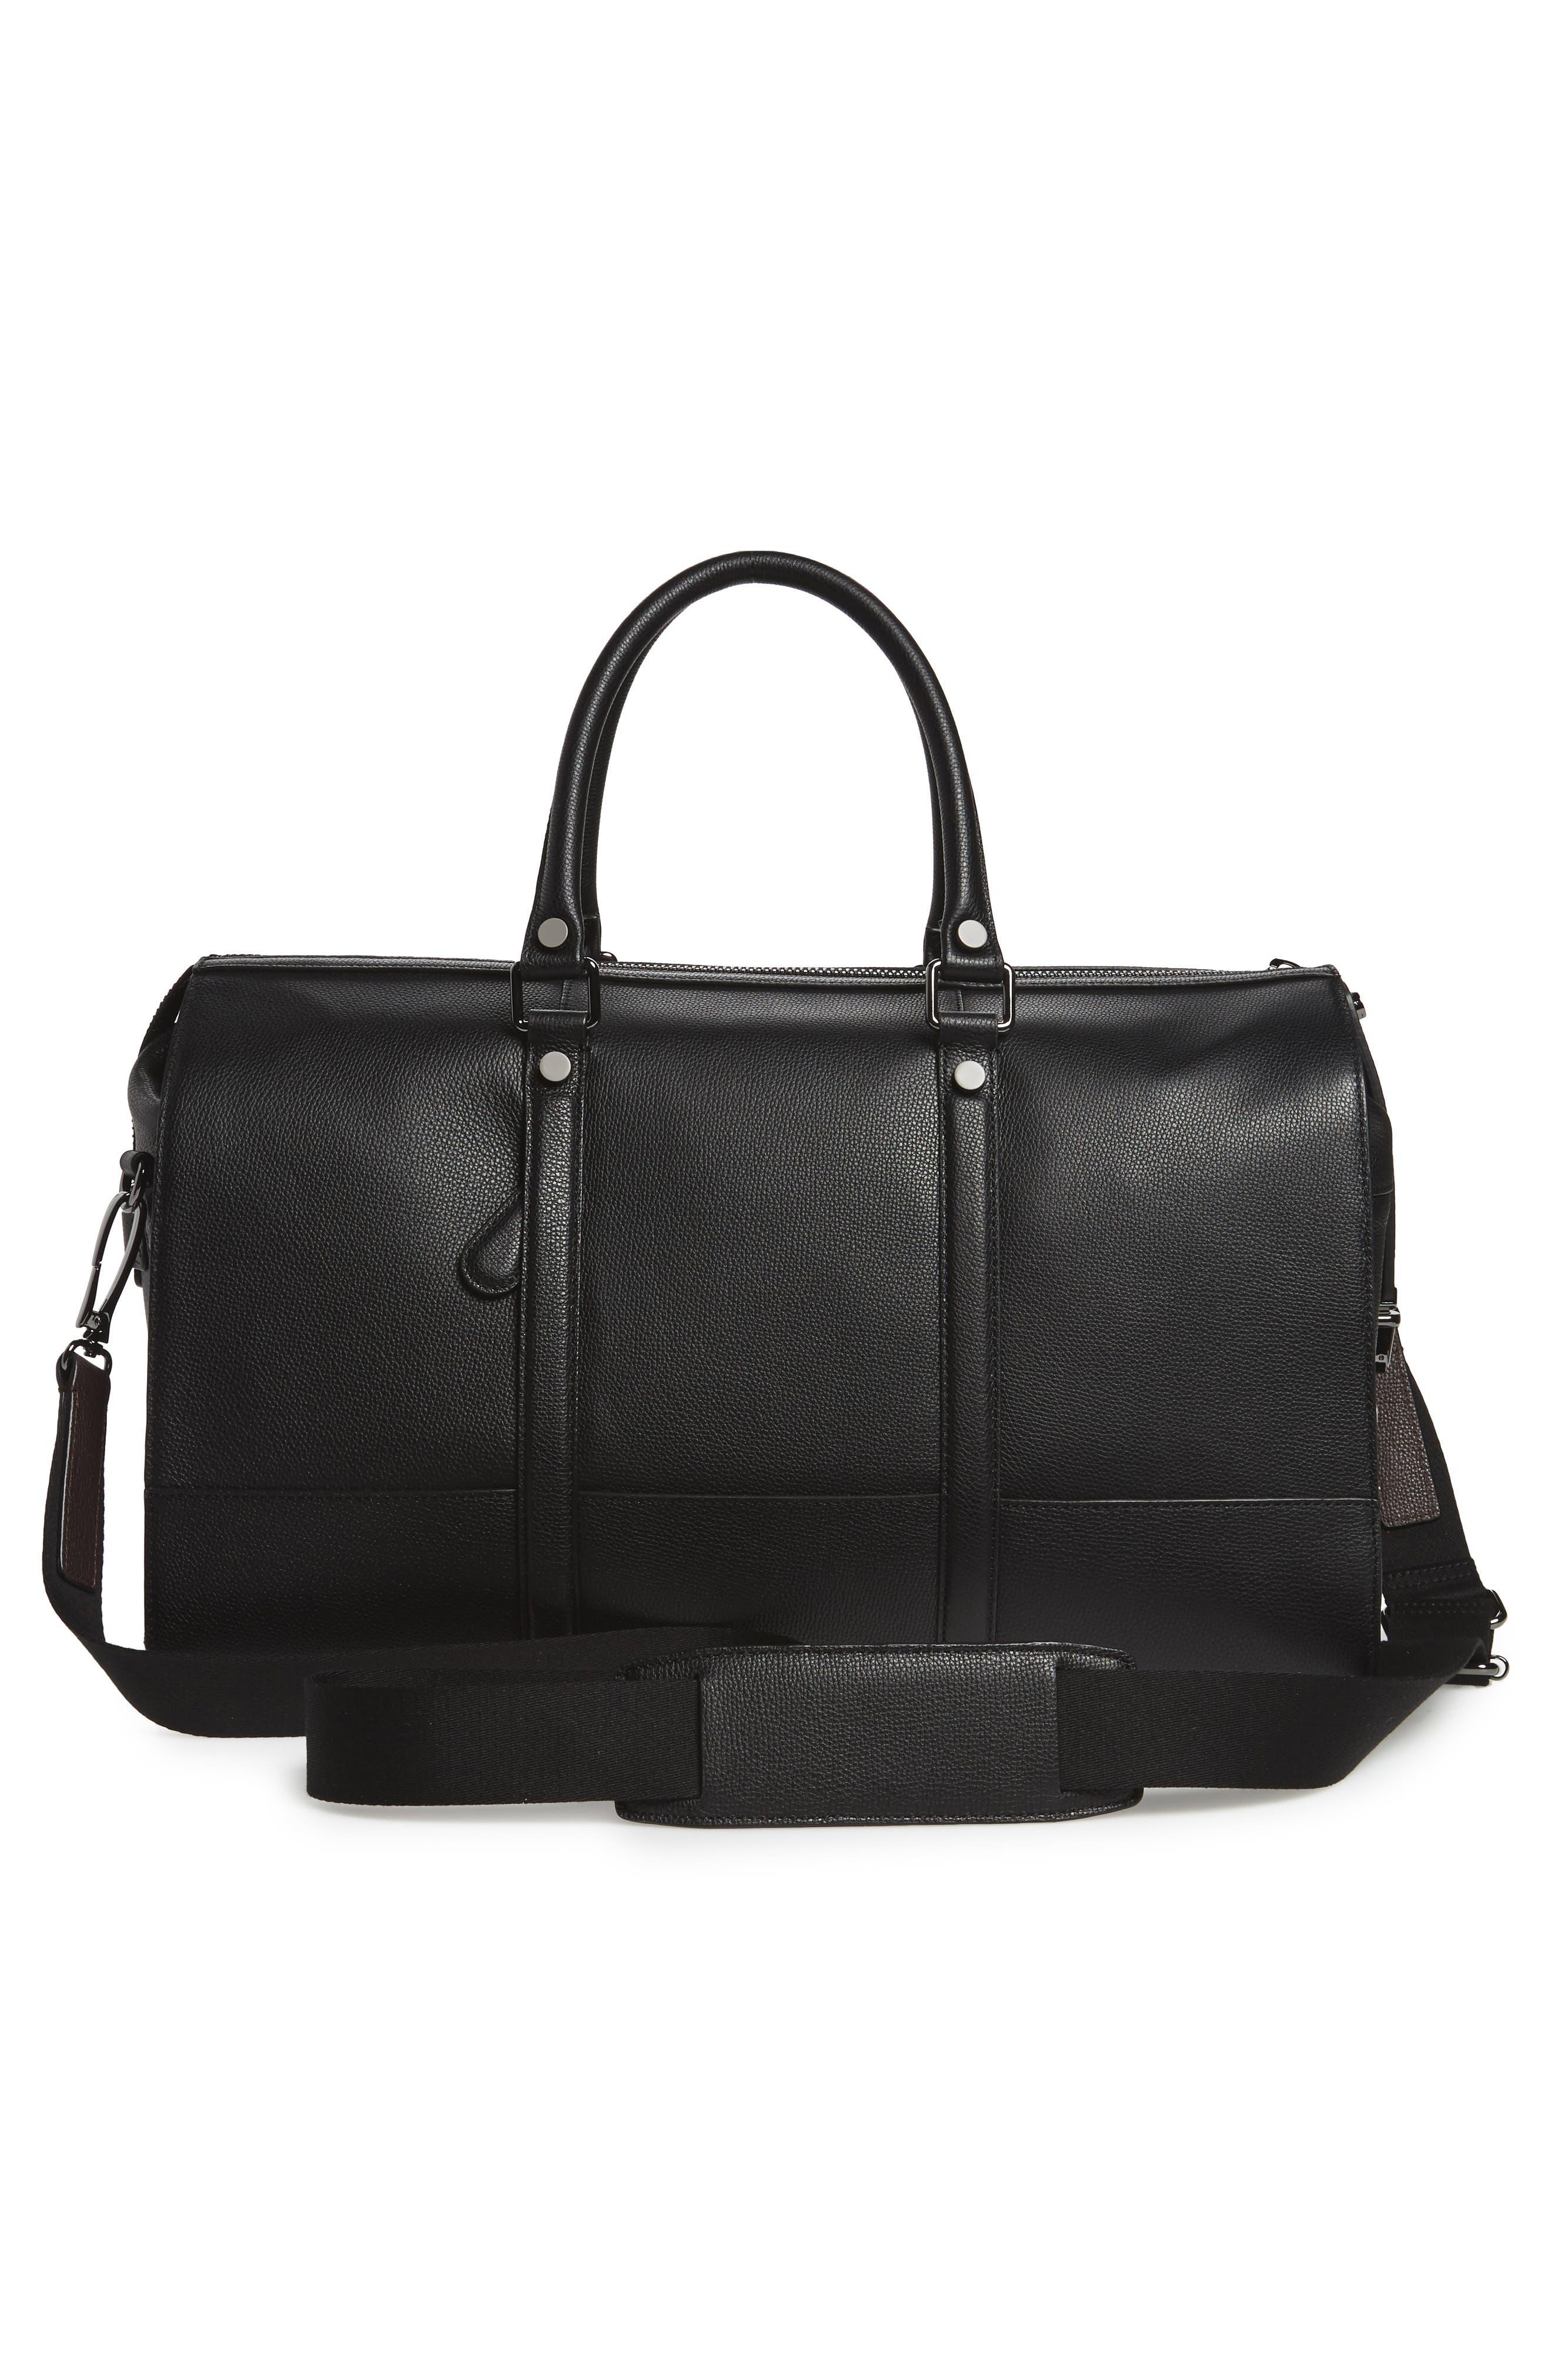 Leather Duffel Bag,                             Alternate thumbnail 3, color,                             001